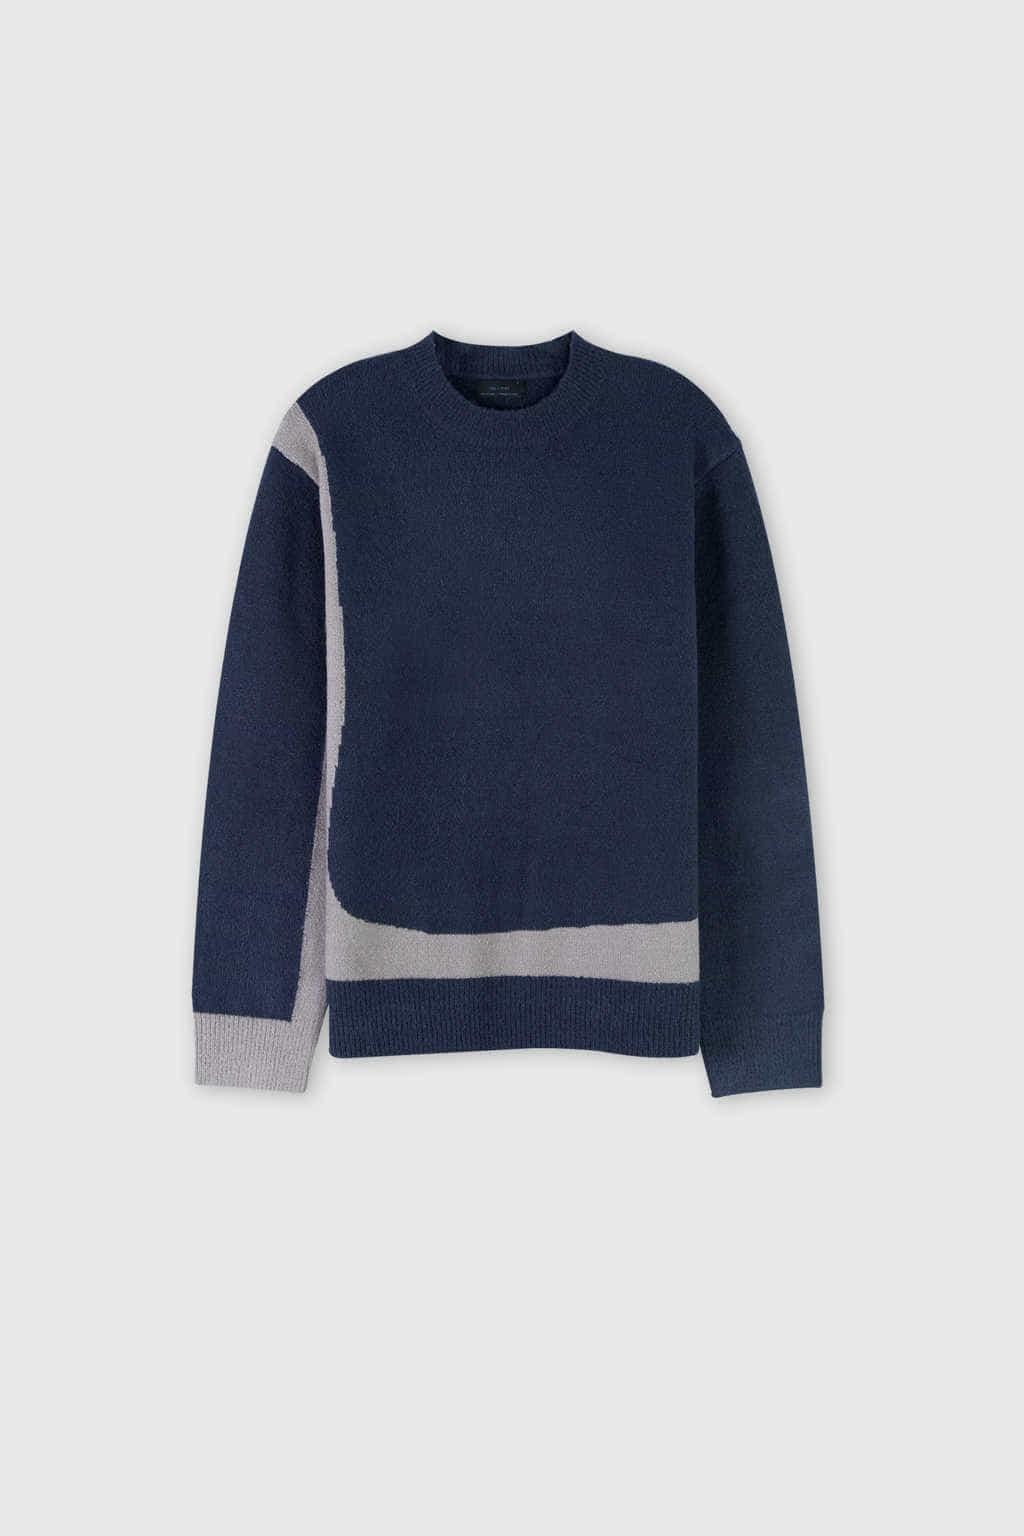 Sweater 2675 Navy 5